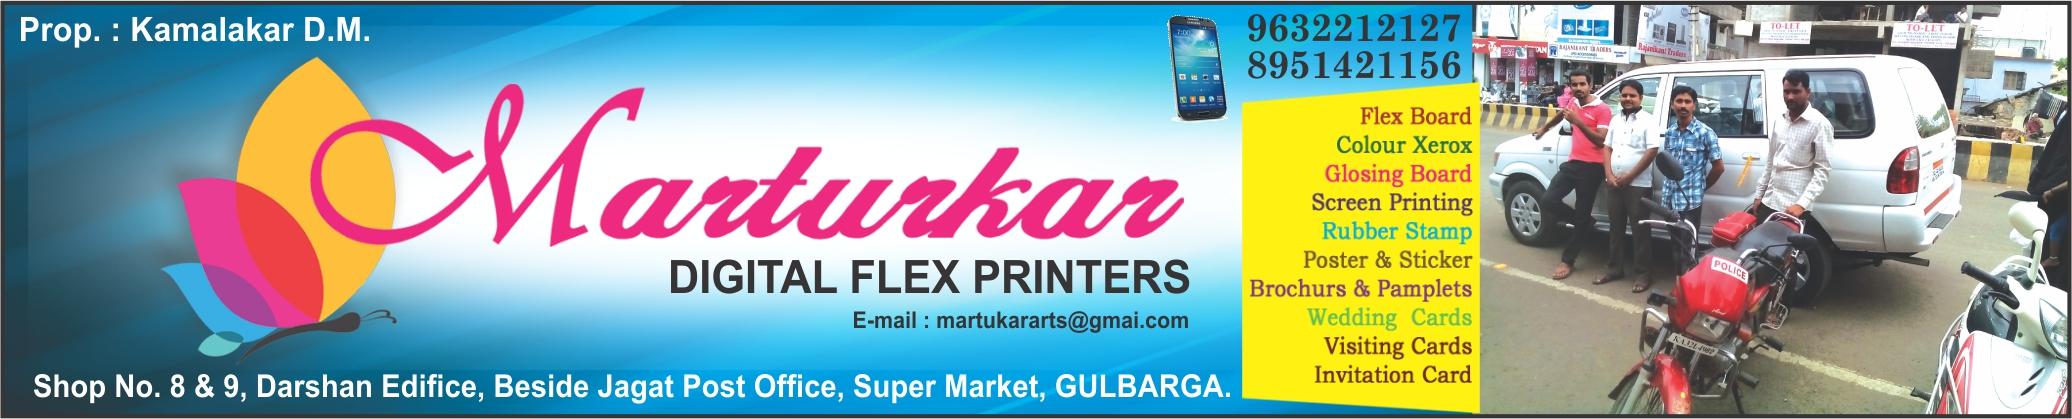 Marturkar Digital Flex Printers